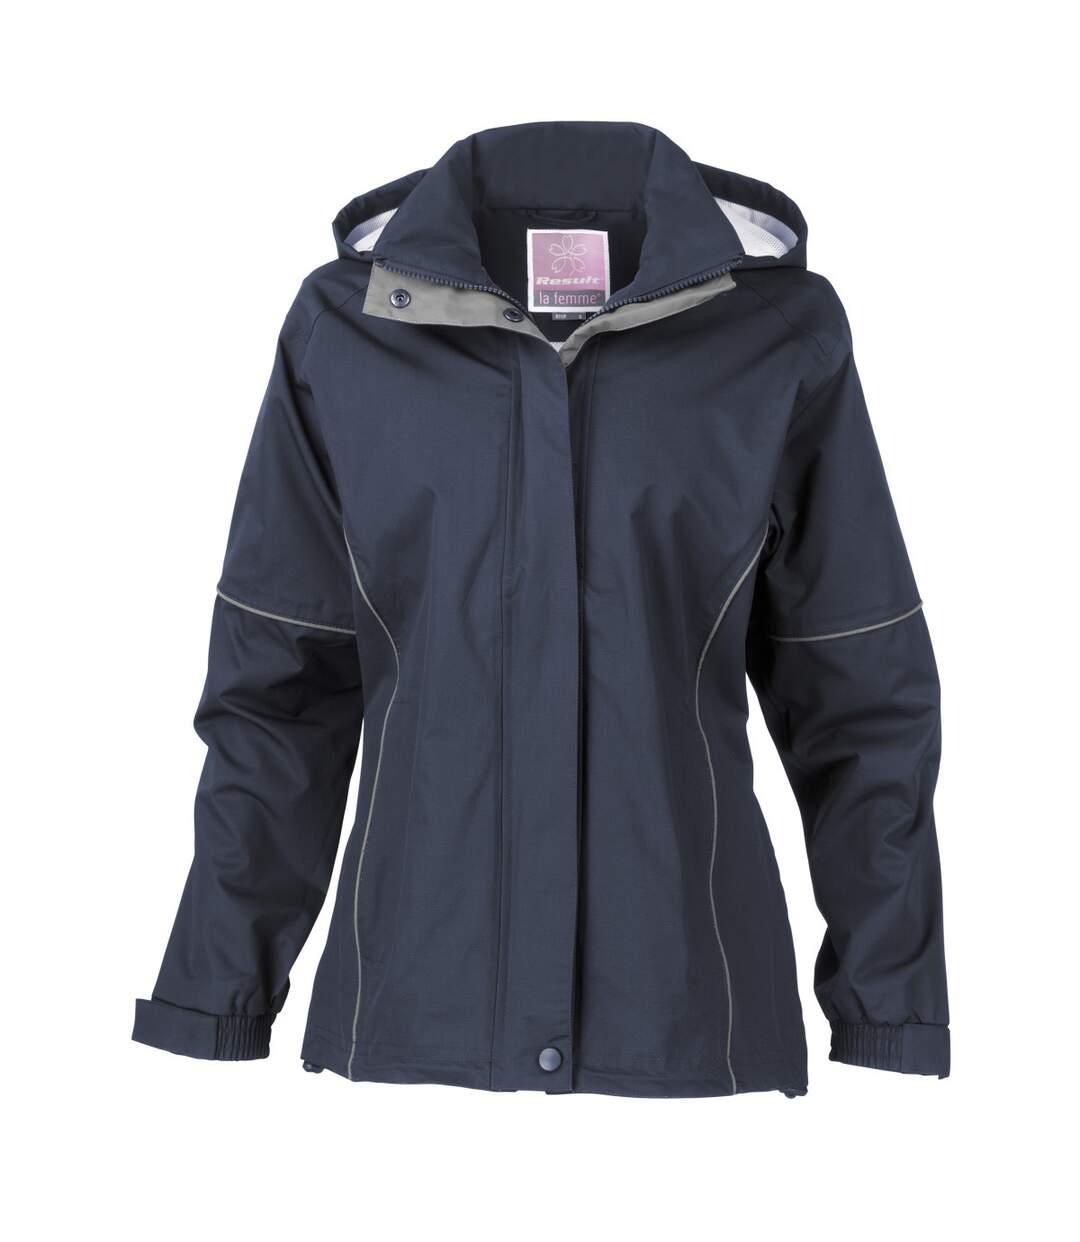 Result Womens/Ladies Urban Fell Lightweight Technical Jacket (Waterproof & Windproof) (Navy Blue) - UTBC3049